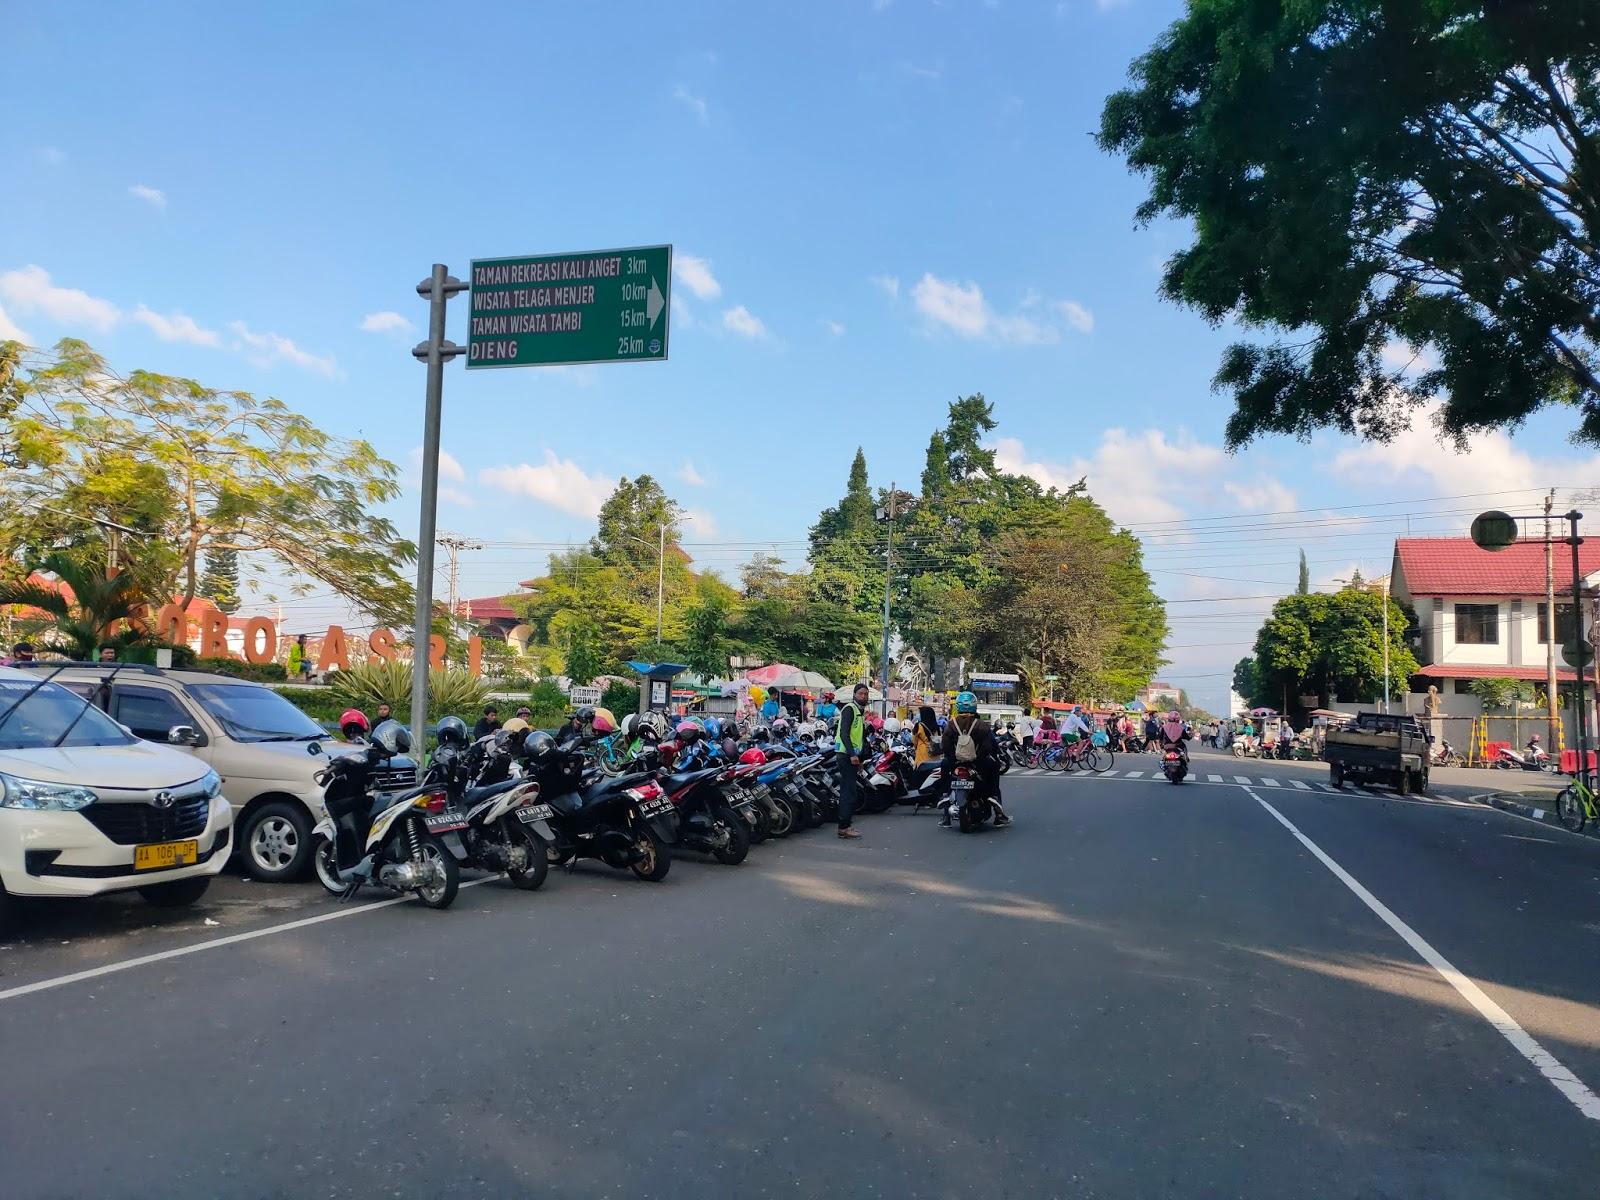 Parkiran Di Alun-Alun Wonosobo Menurut Disperkimhub Ilegal